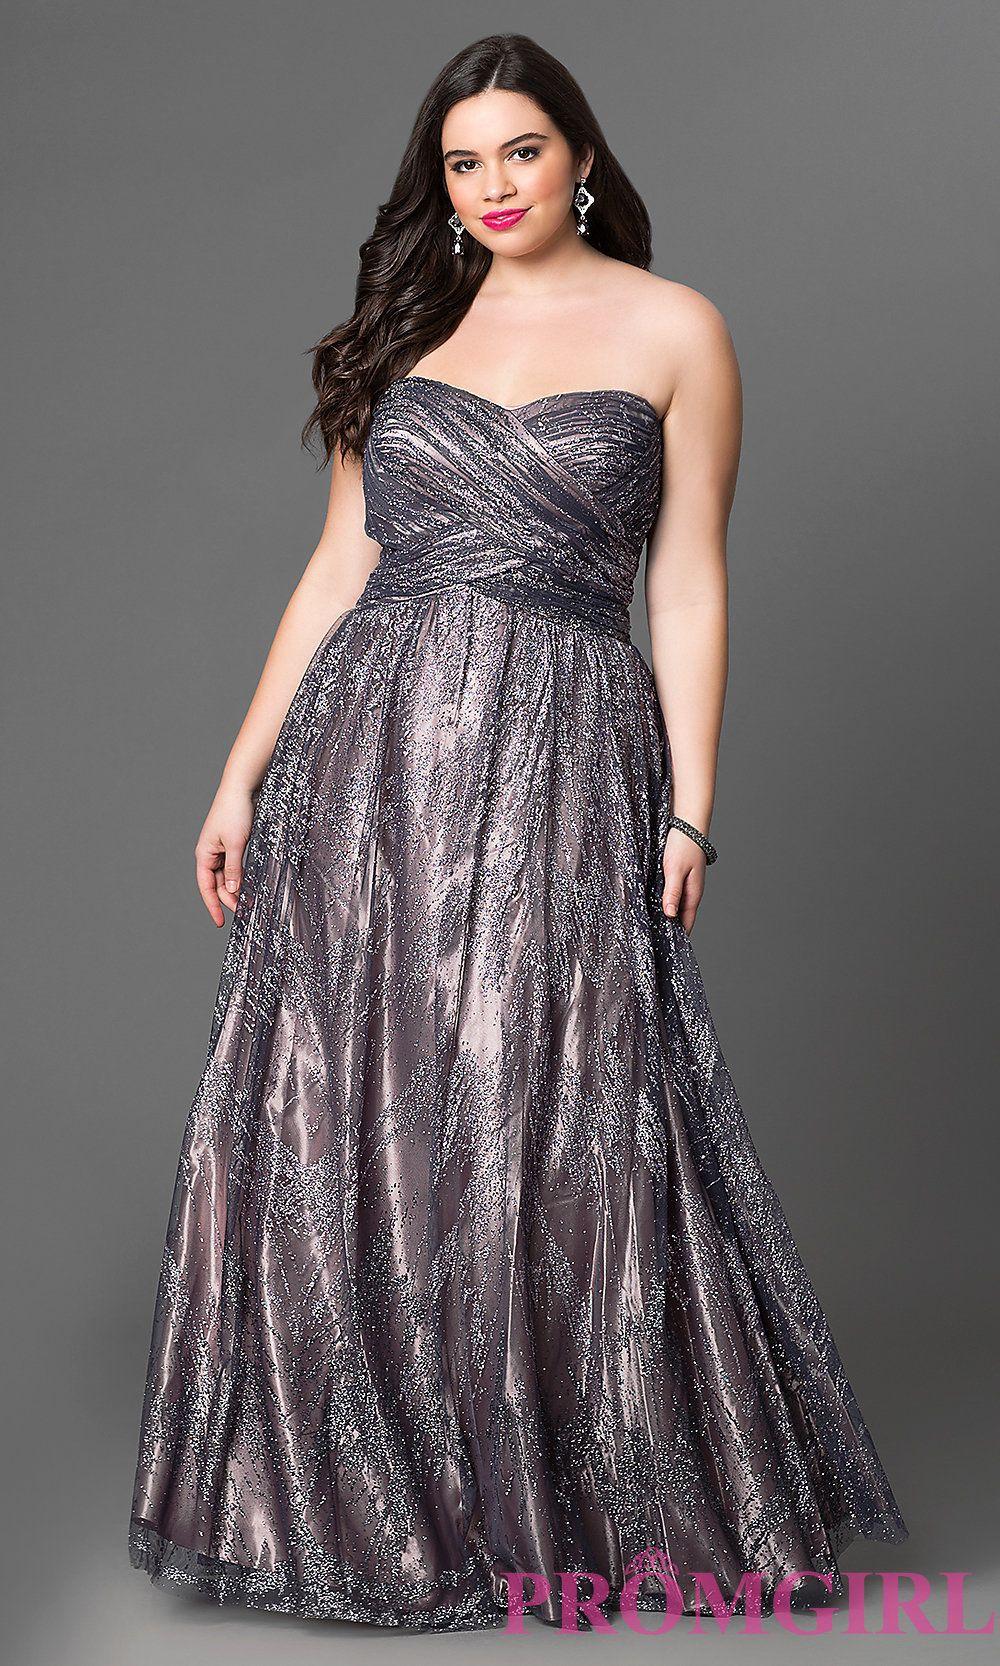 Long metallic strapless plussize prom dress amazing fullfigured